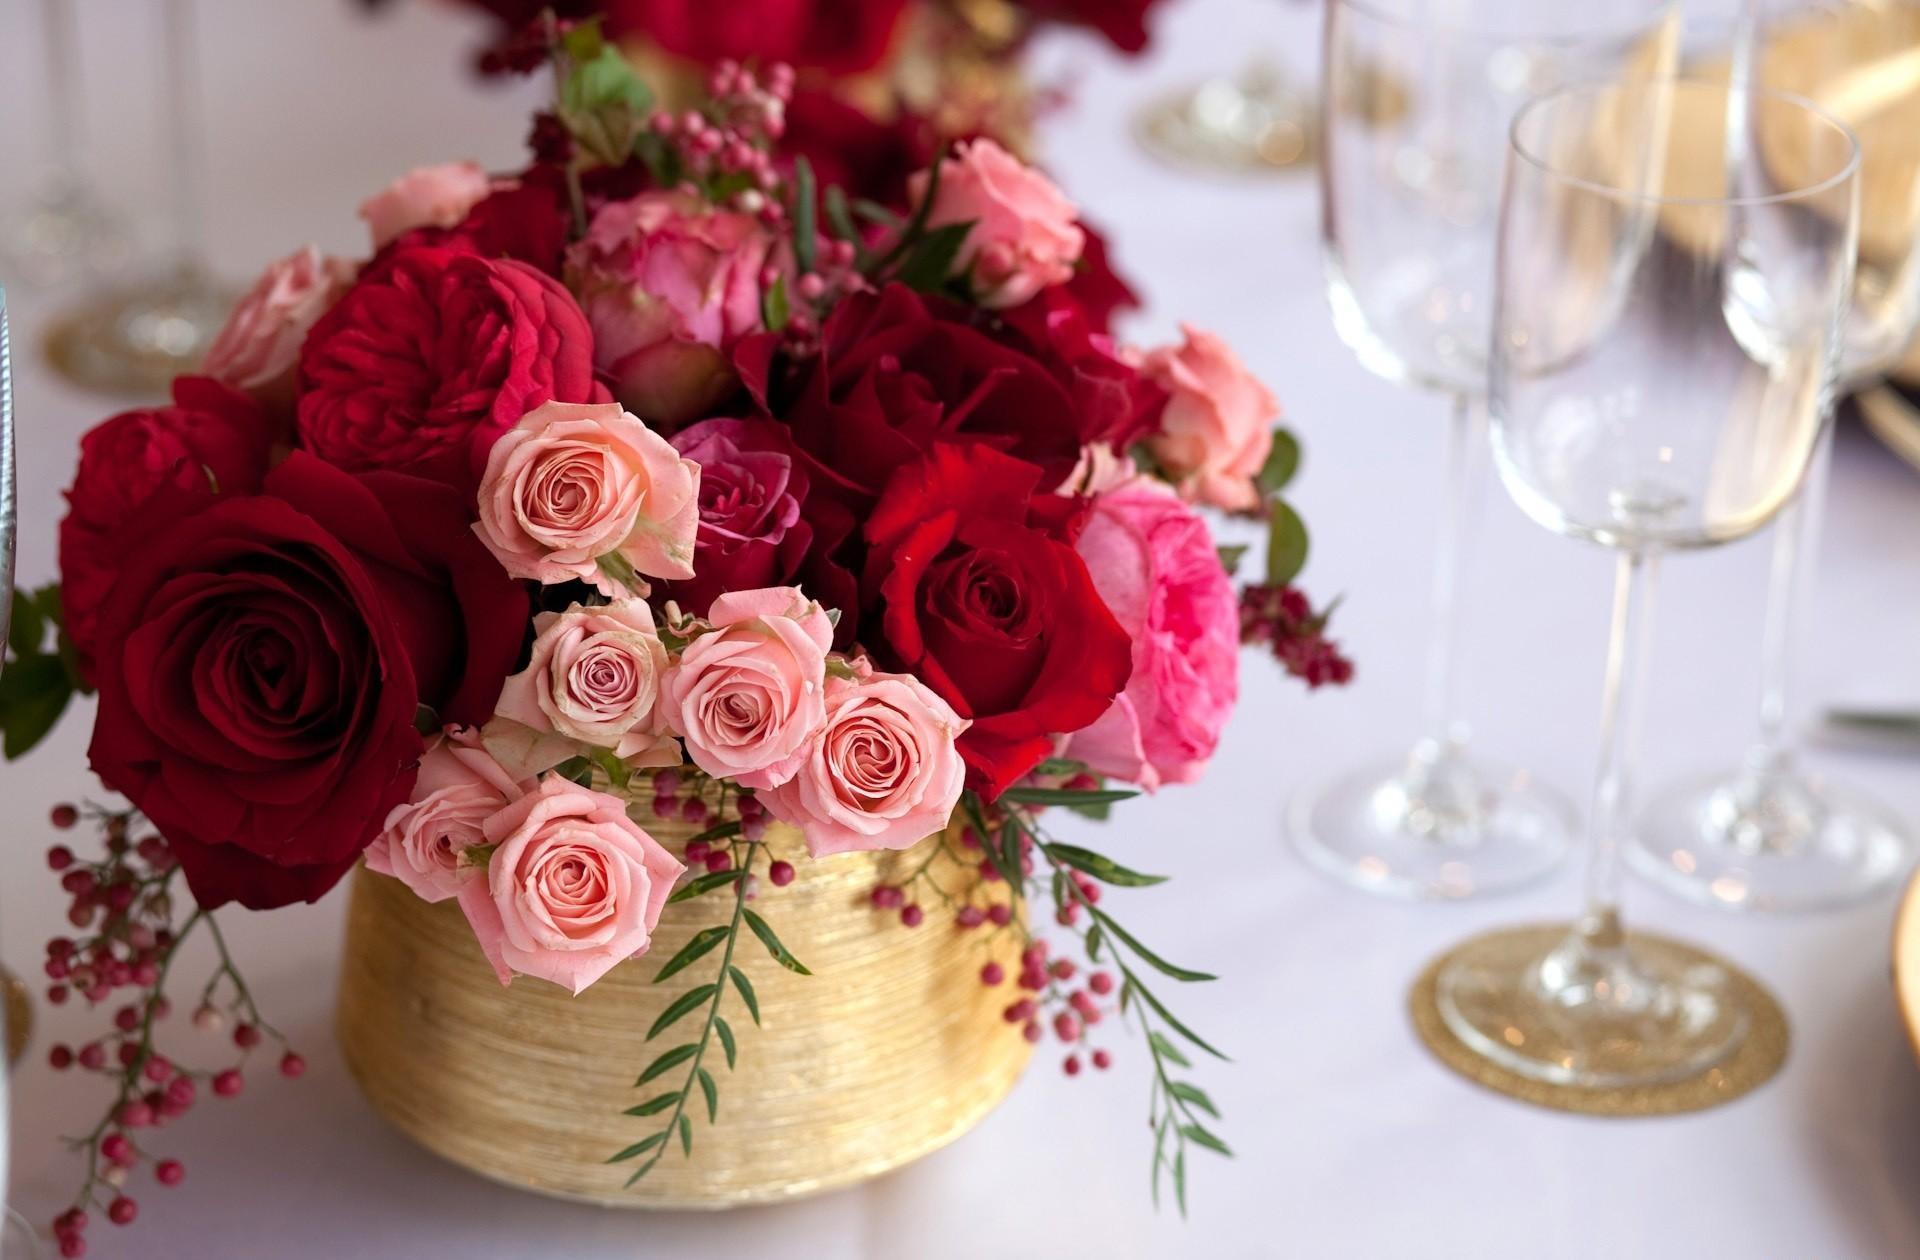 94324 descargar fondo de pantalla Roses, Flores, Bayas, Registro, Tipografía, Mesa, Copas De Vino: protectores de pantalla e imágenes gratis